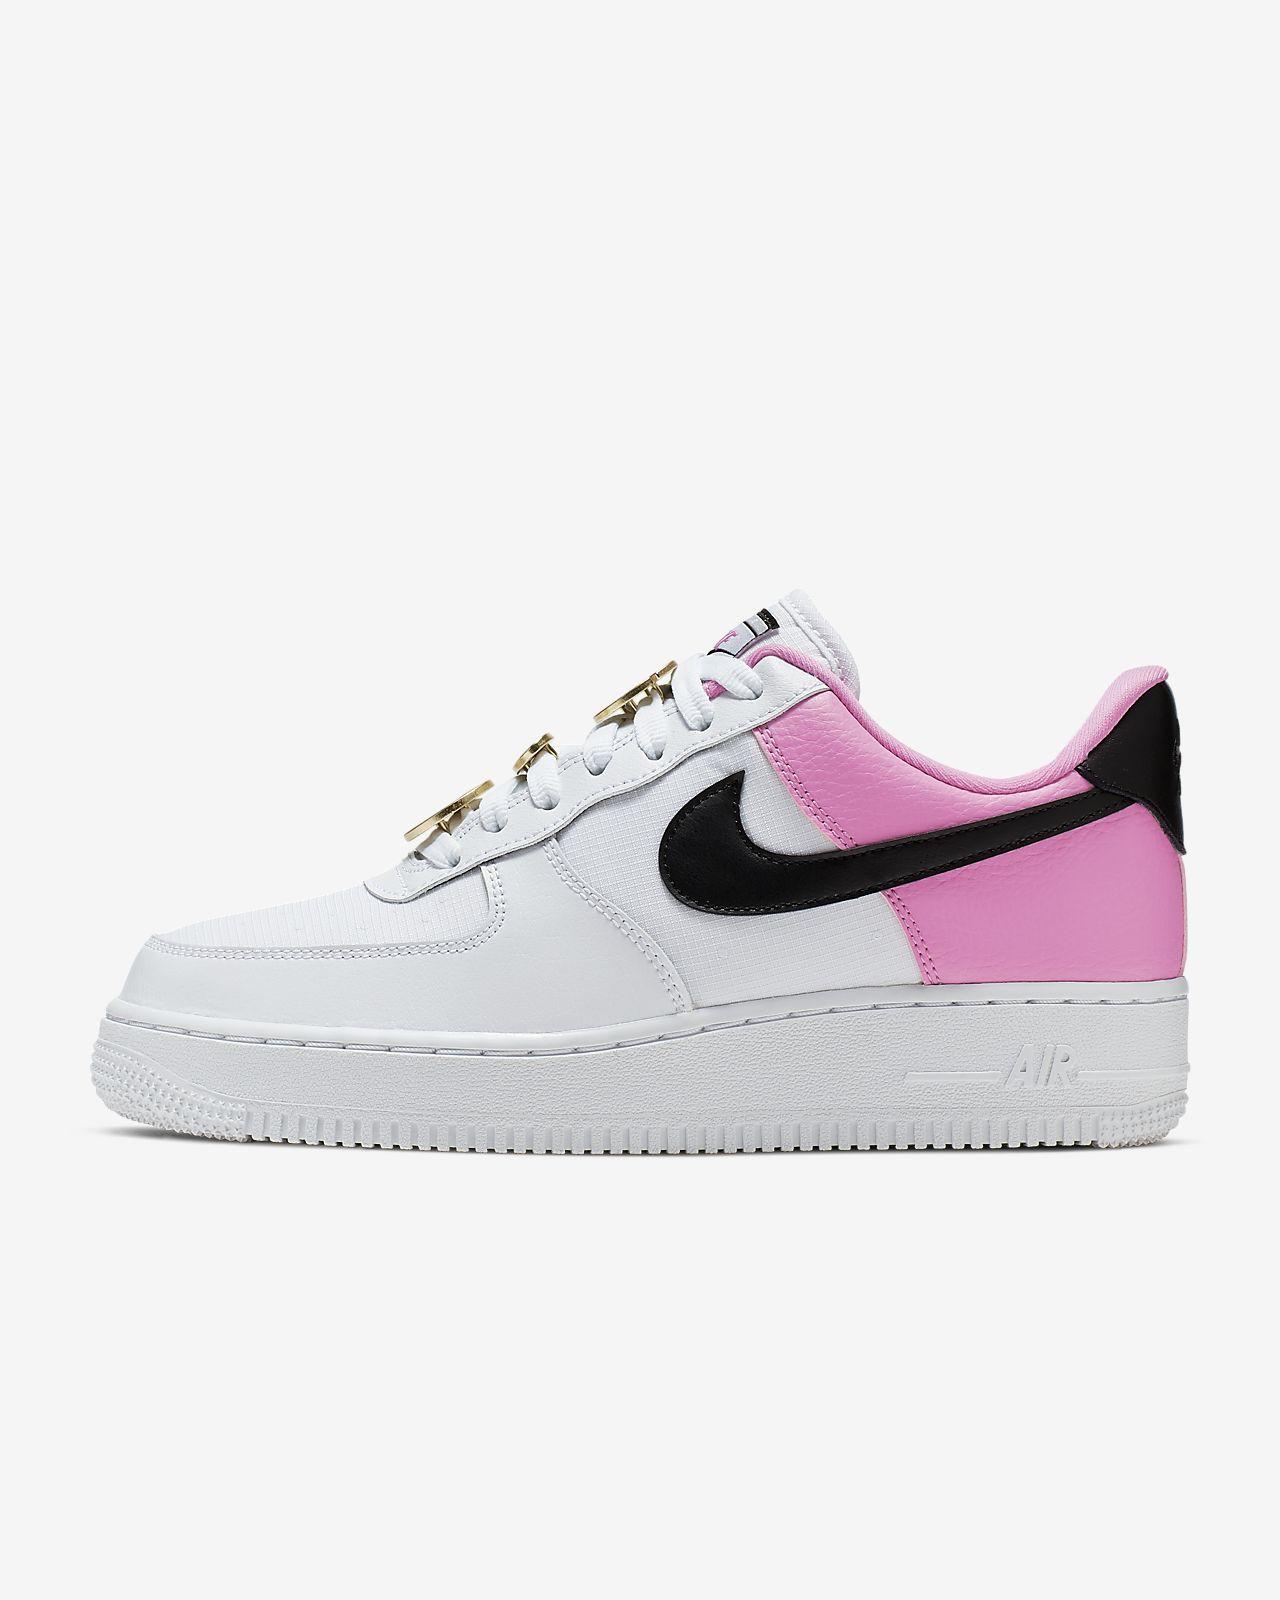 Air Force 1 Se Pour Chaussure Nike '07 FemmeFr WDH2IE9eY